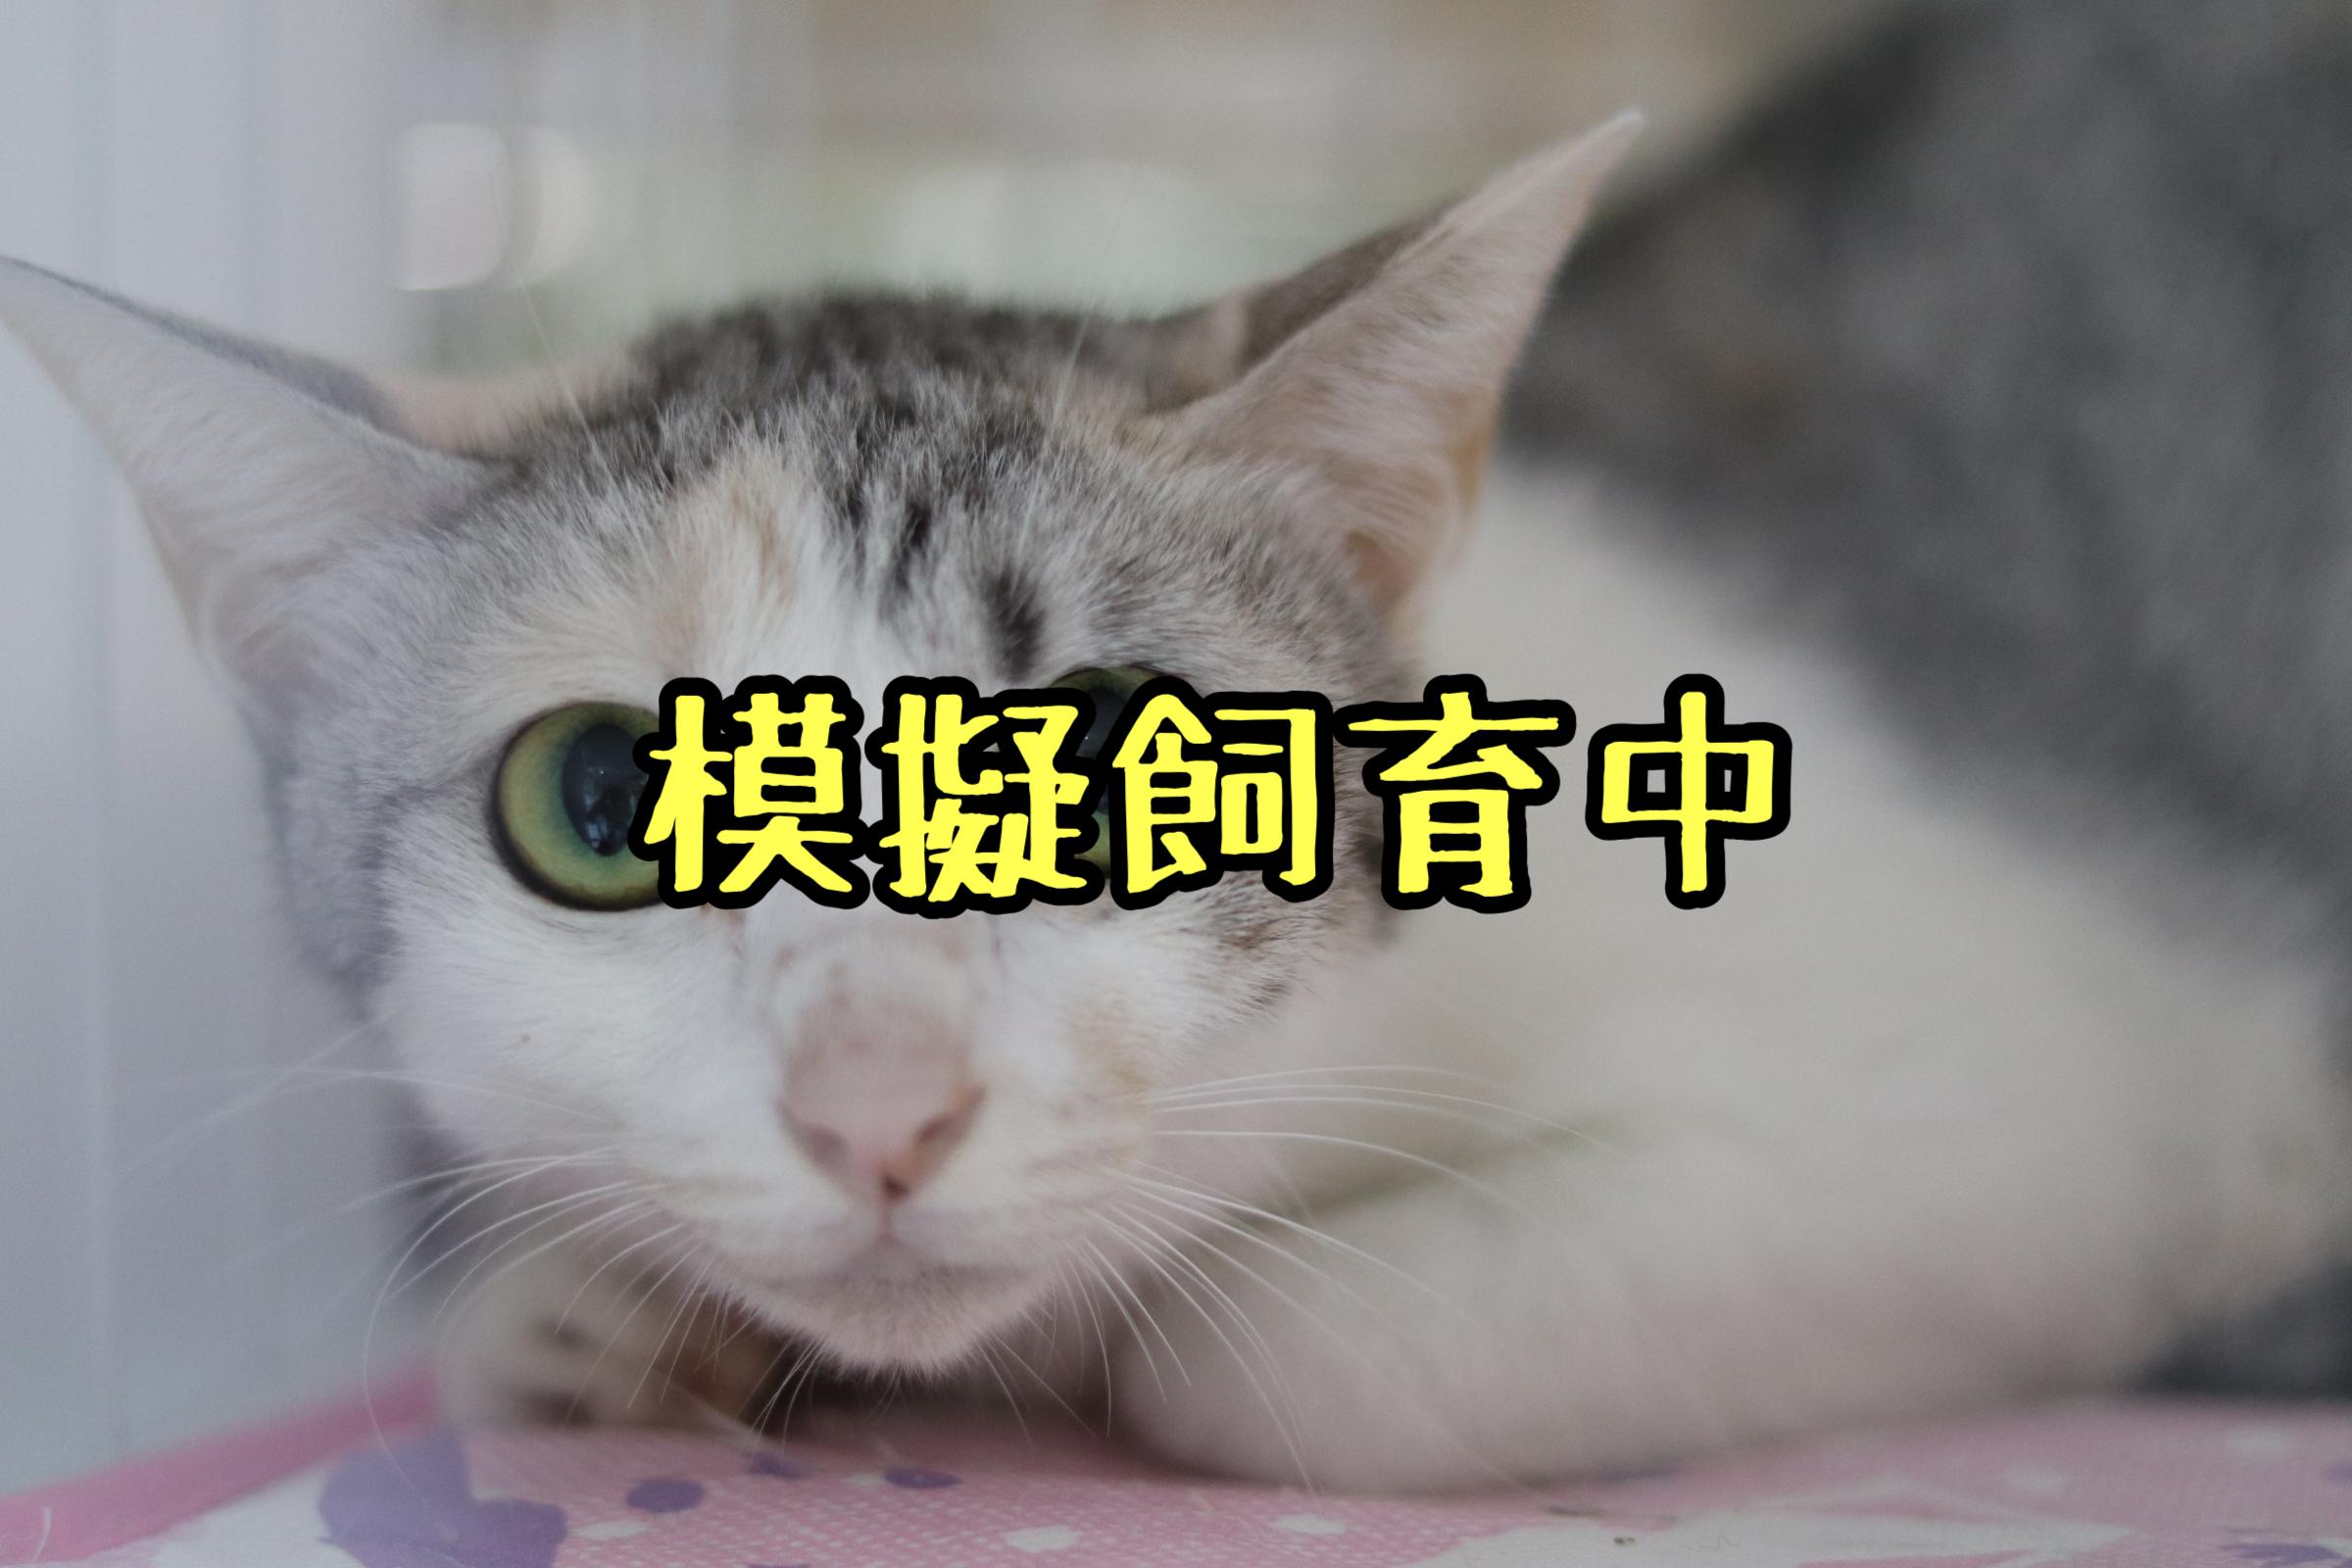 <ul> <li>猫種:日本猫</li> <li>名前(性別):ジュリ(女の子)</li> <li>年齢:2018年頃生まれ</li> <li>保護経緯:飼い主が高齢になり認知症のため飼育困難</li> </ul>